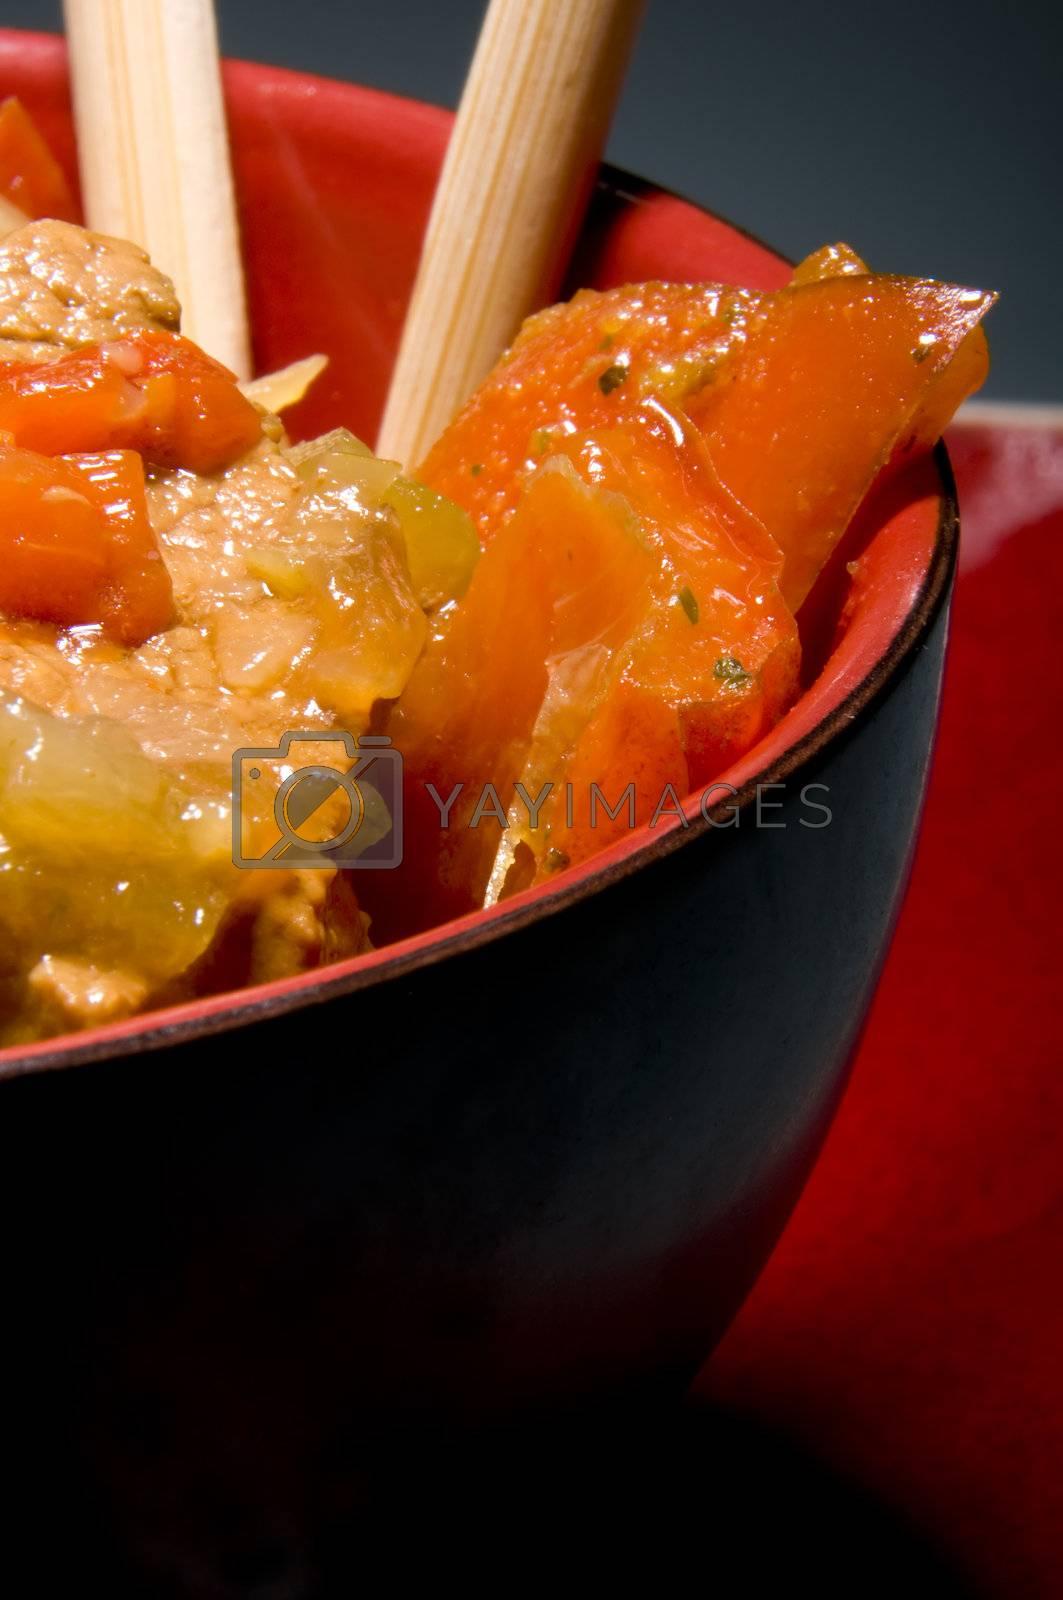 Japanese cuisine by aaron_stein